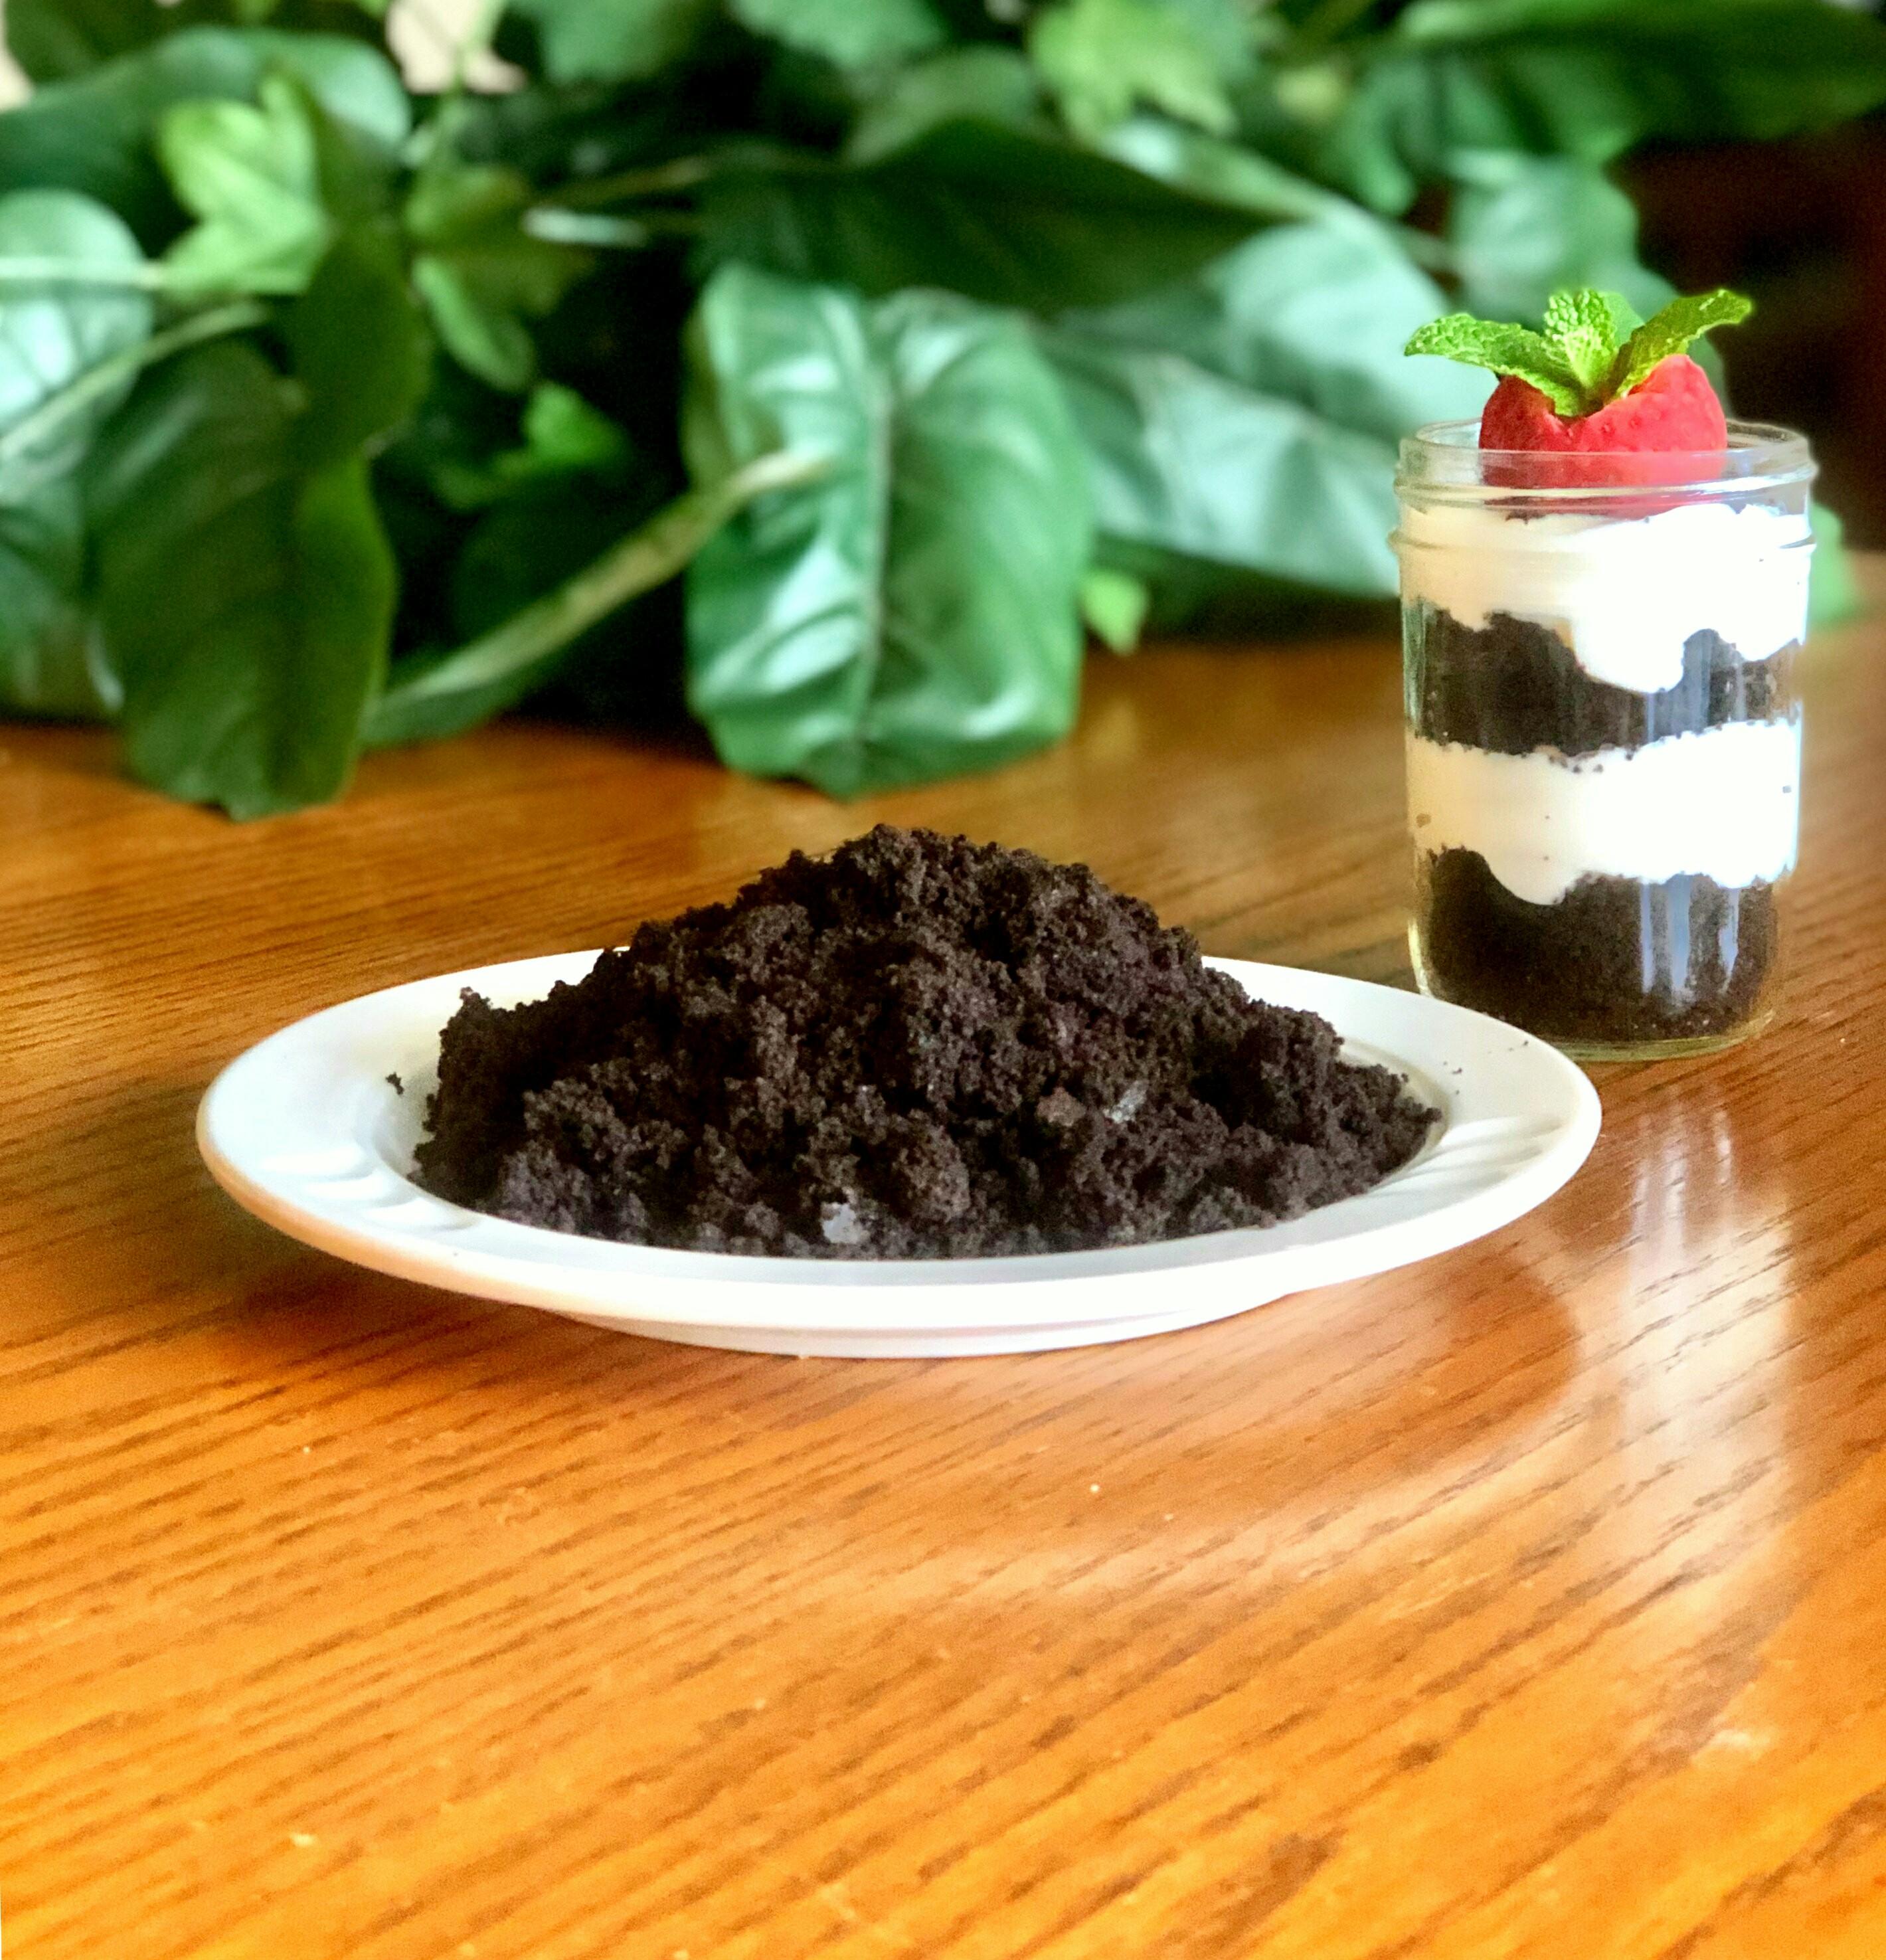 Homemade Chocolate Cookie Crumbs